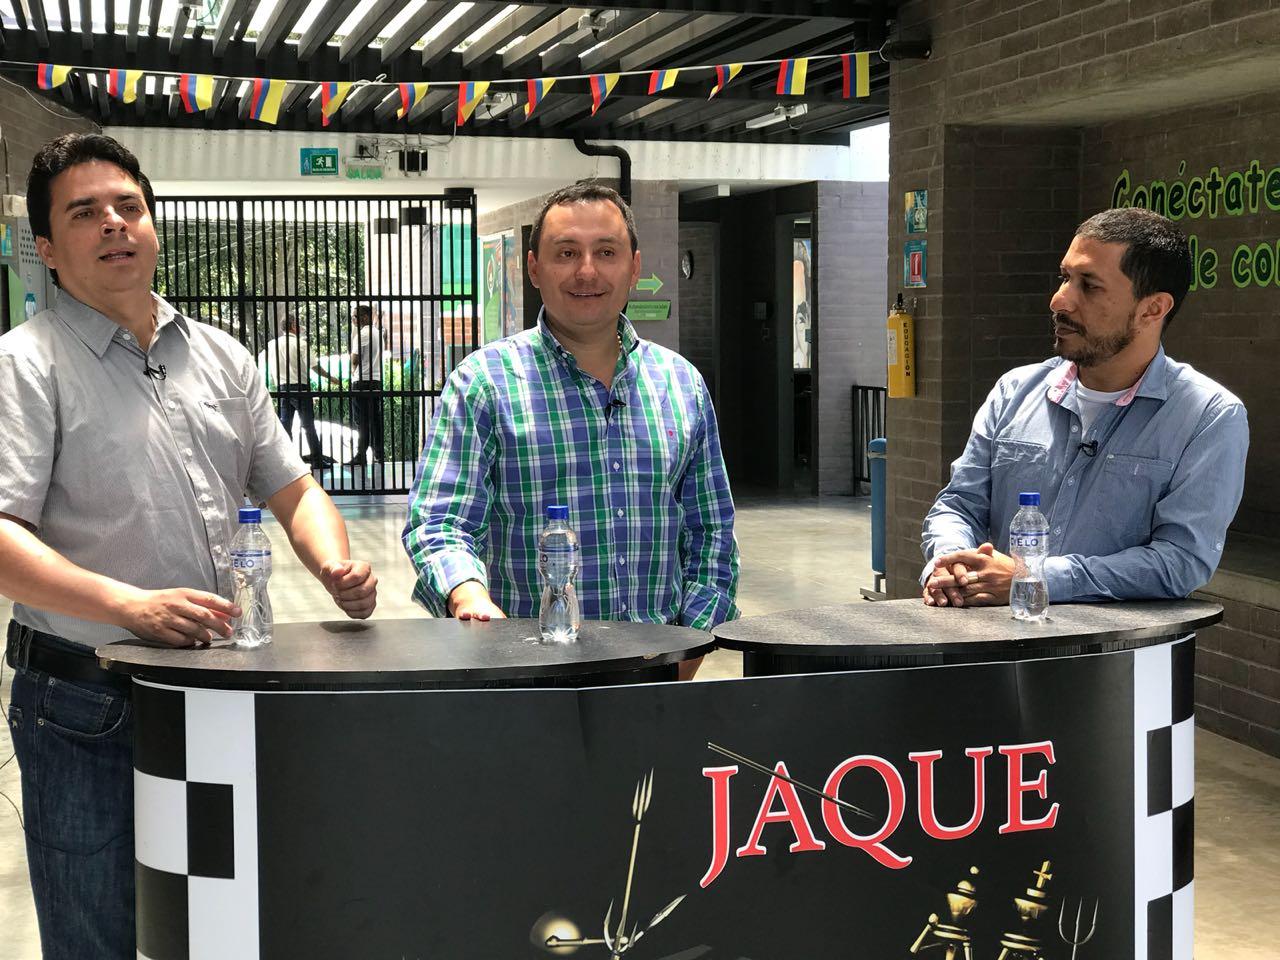 JAQUE, invitado Elkin Ospina, alcalde del municipio de La Ceja del Tambo. Parte 1